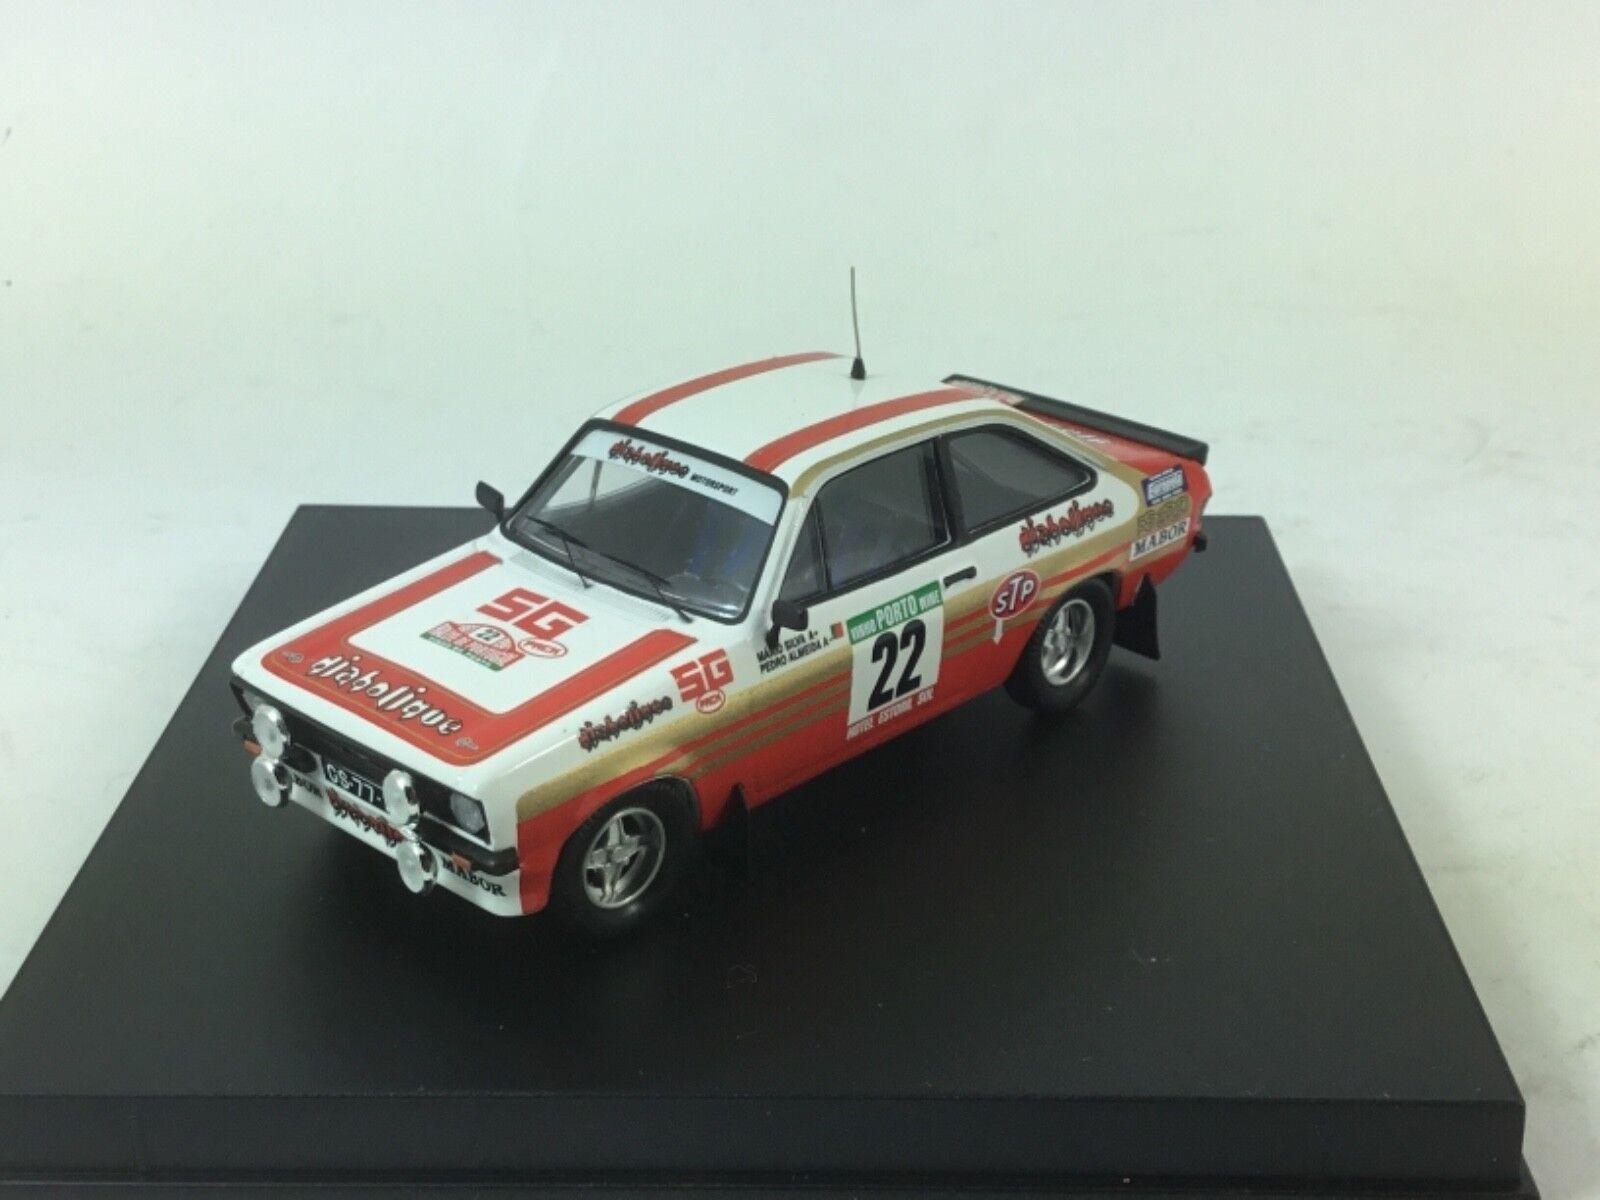 bienvenido a elegir Trofeu 1020 Ford Escort MK MK MK II RALLY PORTUGAL 1981-M Silva escala 1 43  mas preferencial